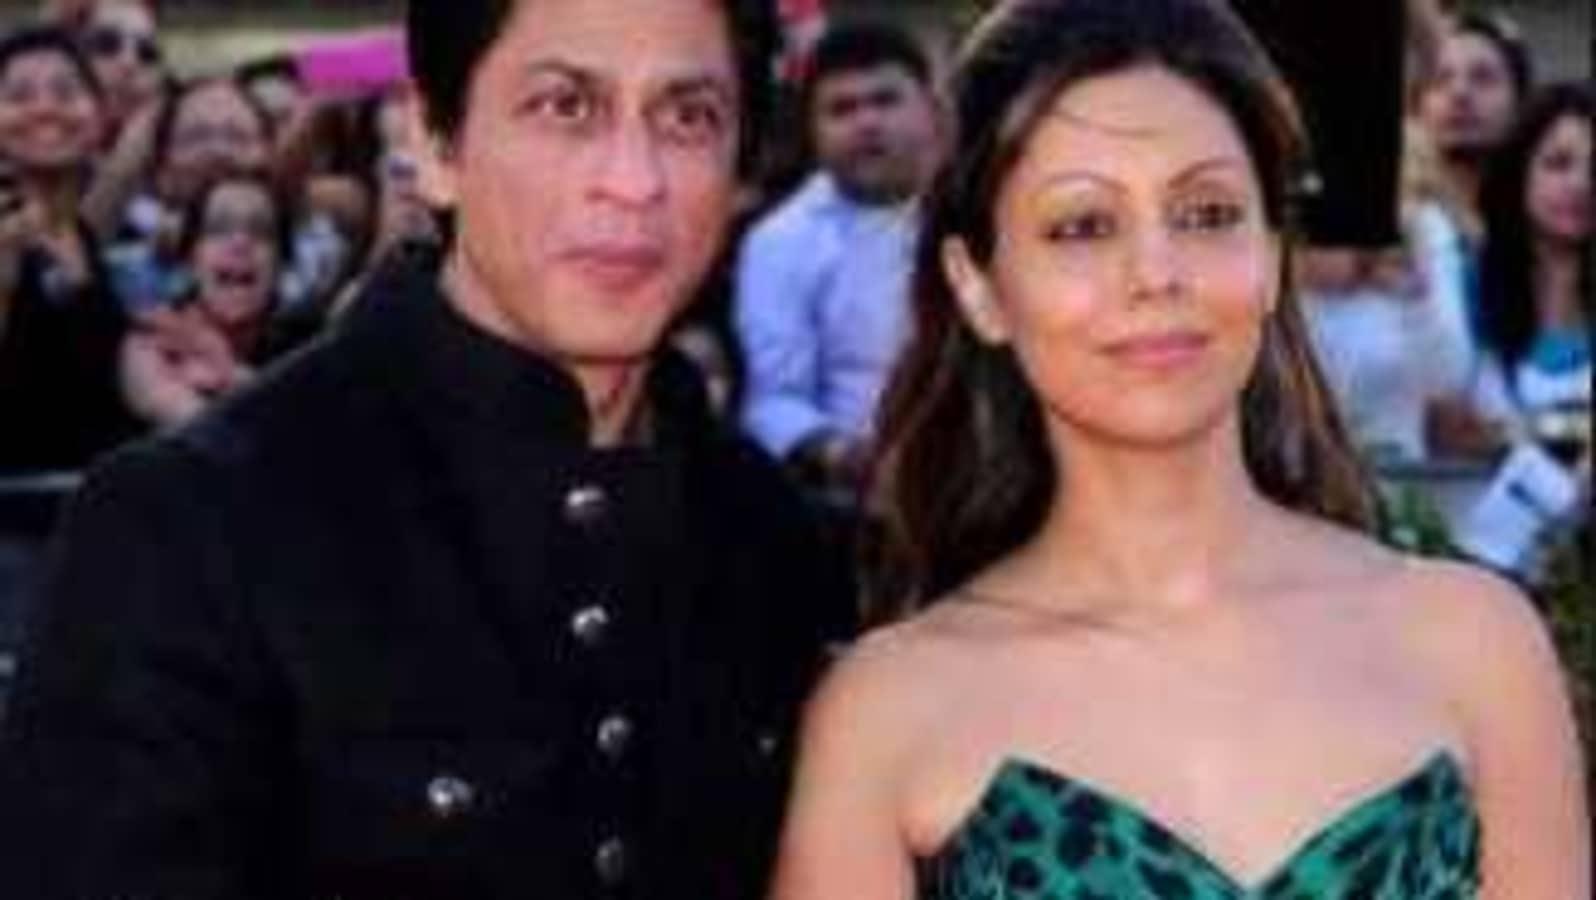 Gauri Khan shares a glorious throwback pic with Shah Rukh Khan, see here - Hindustan Times